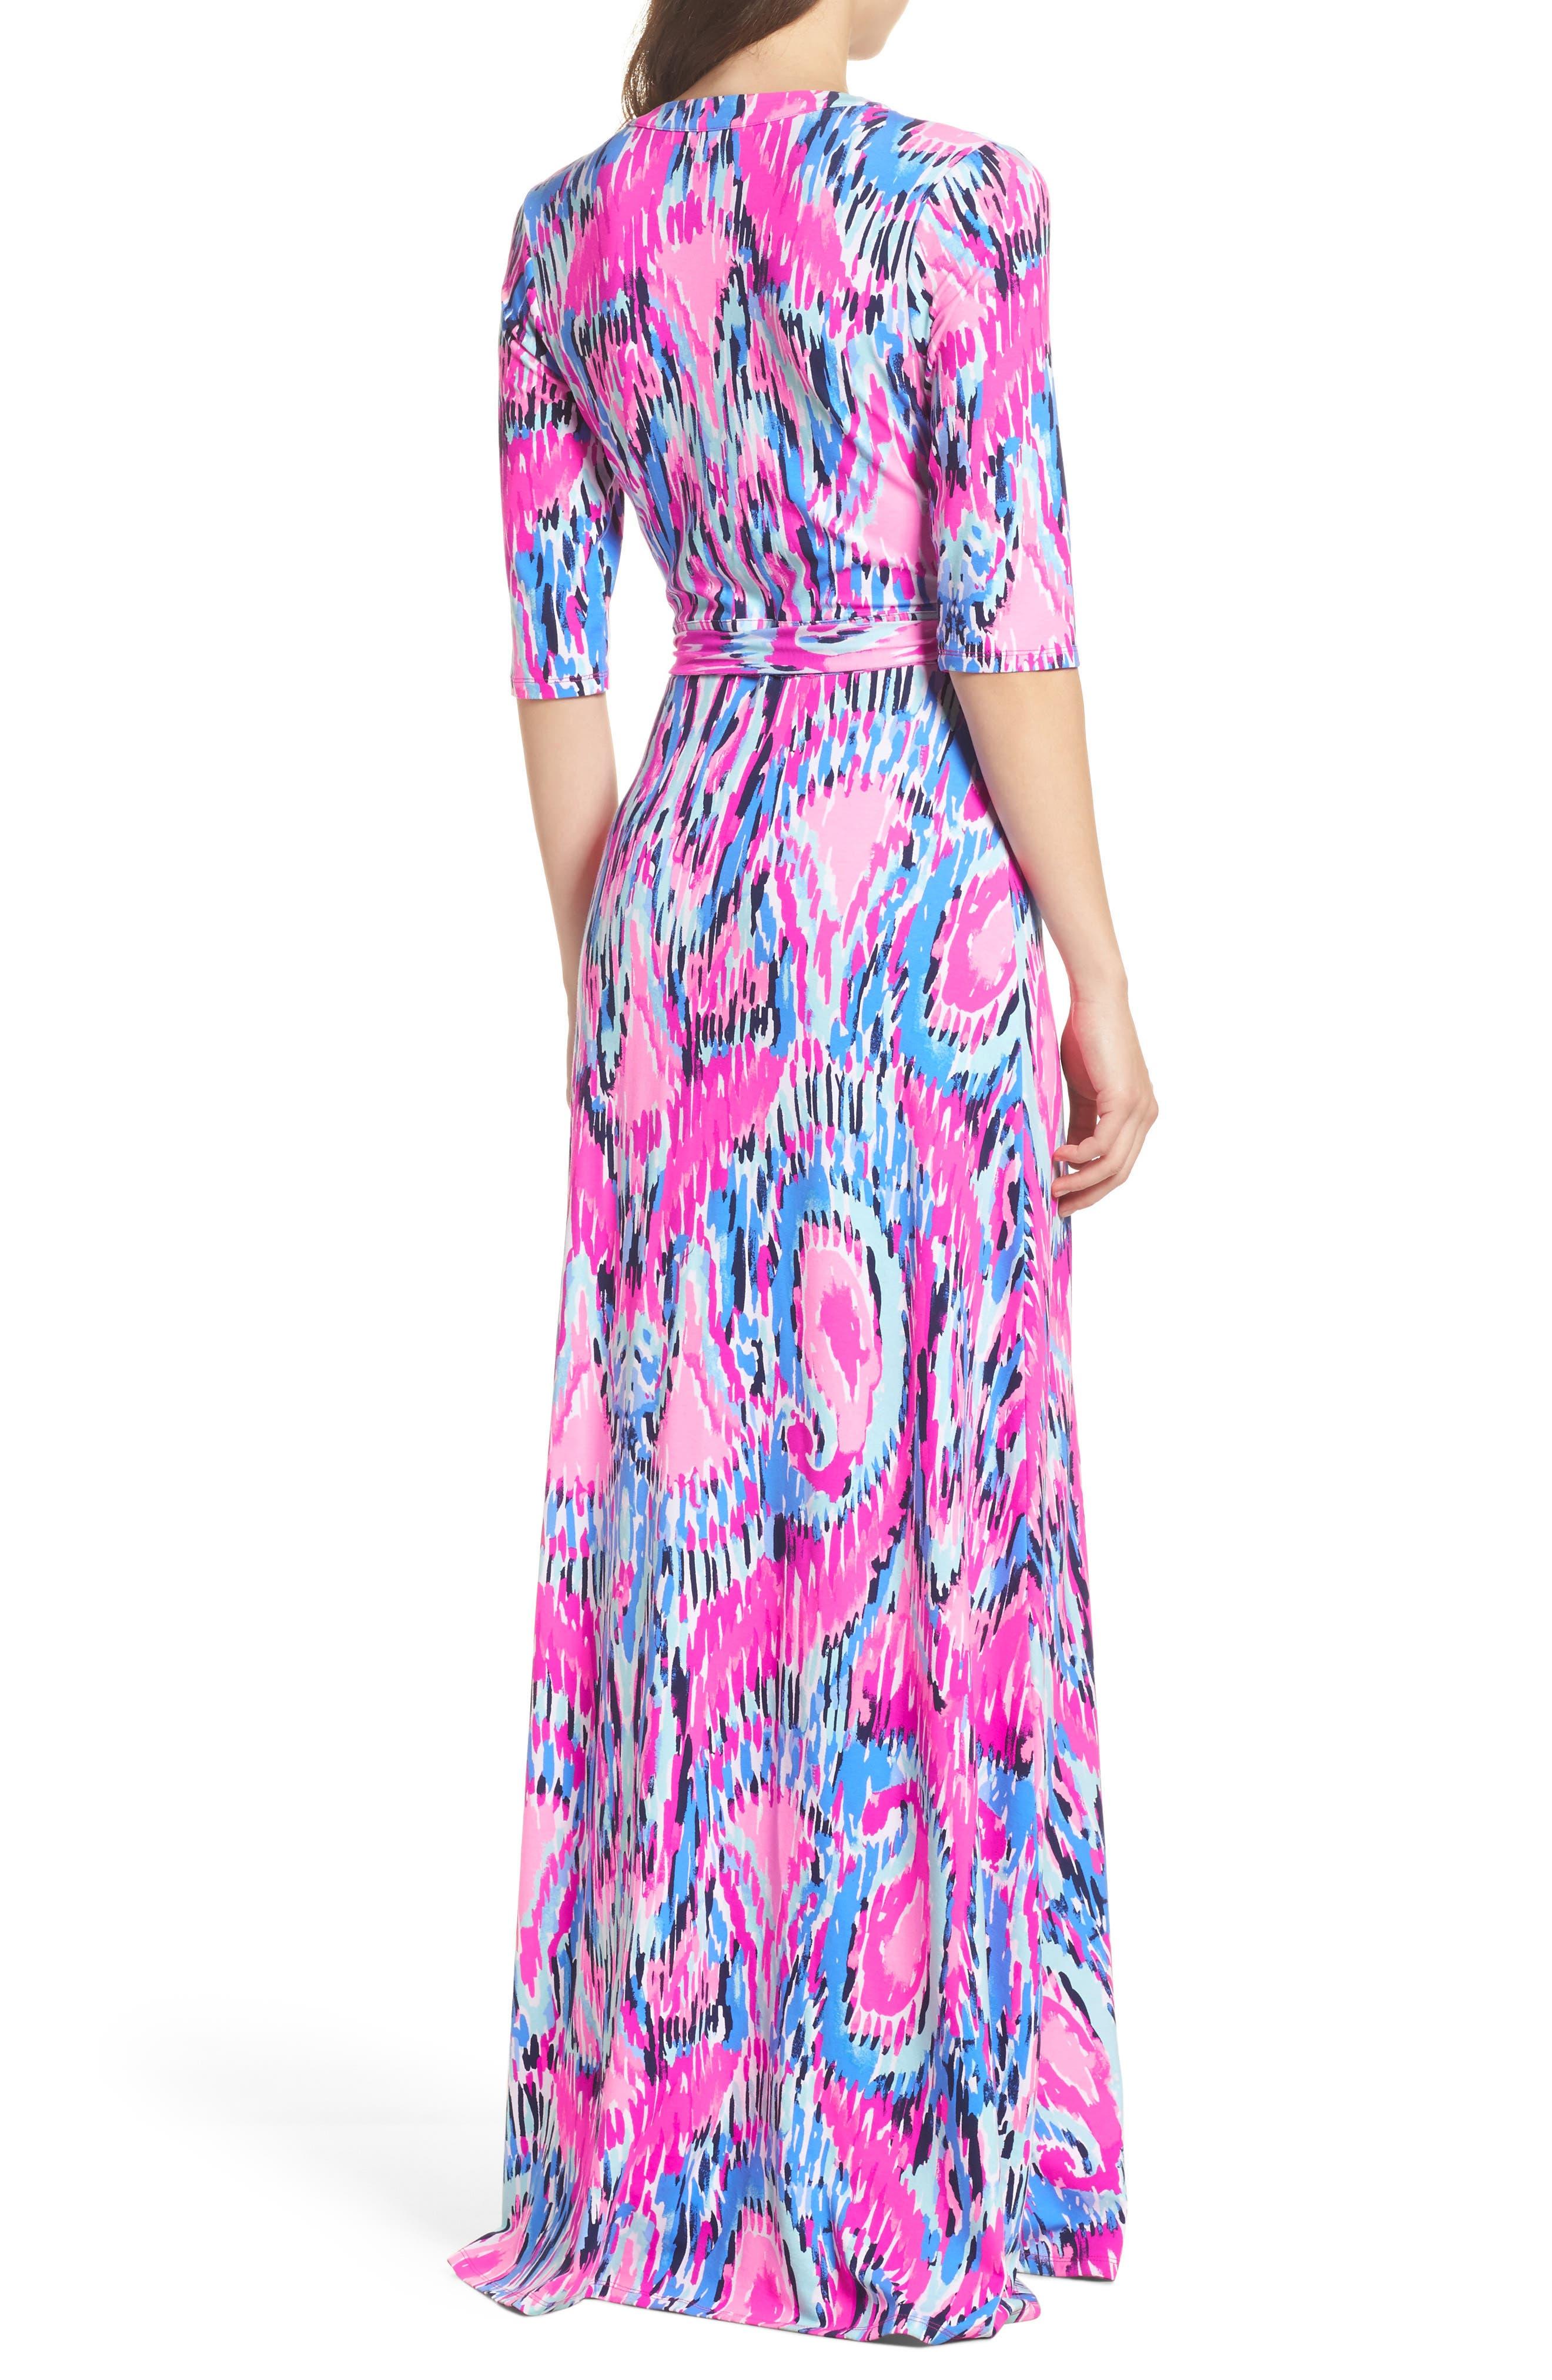 Marvista Wrap Maxi Dress,                             Alternate thumbnail 2, color,                             Multi Free Spirit